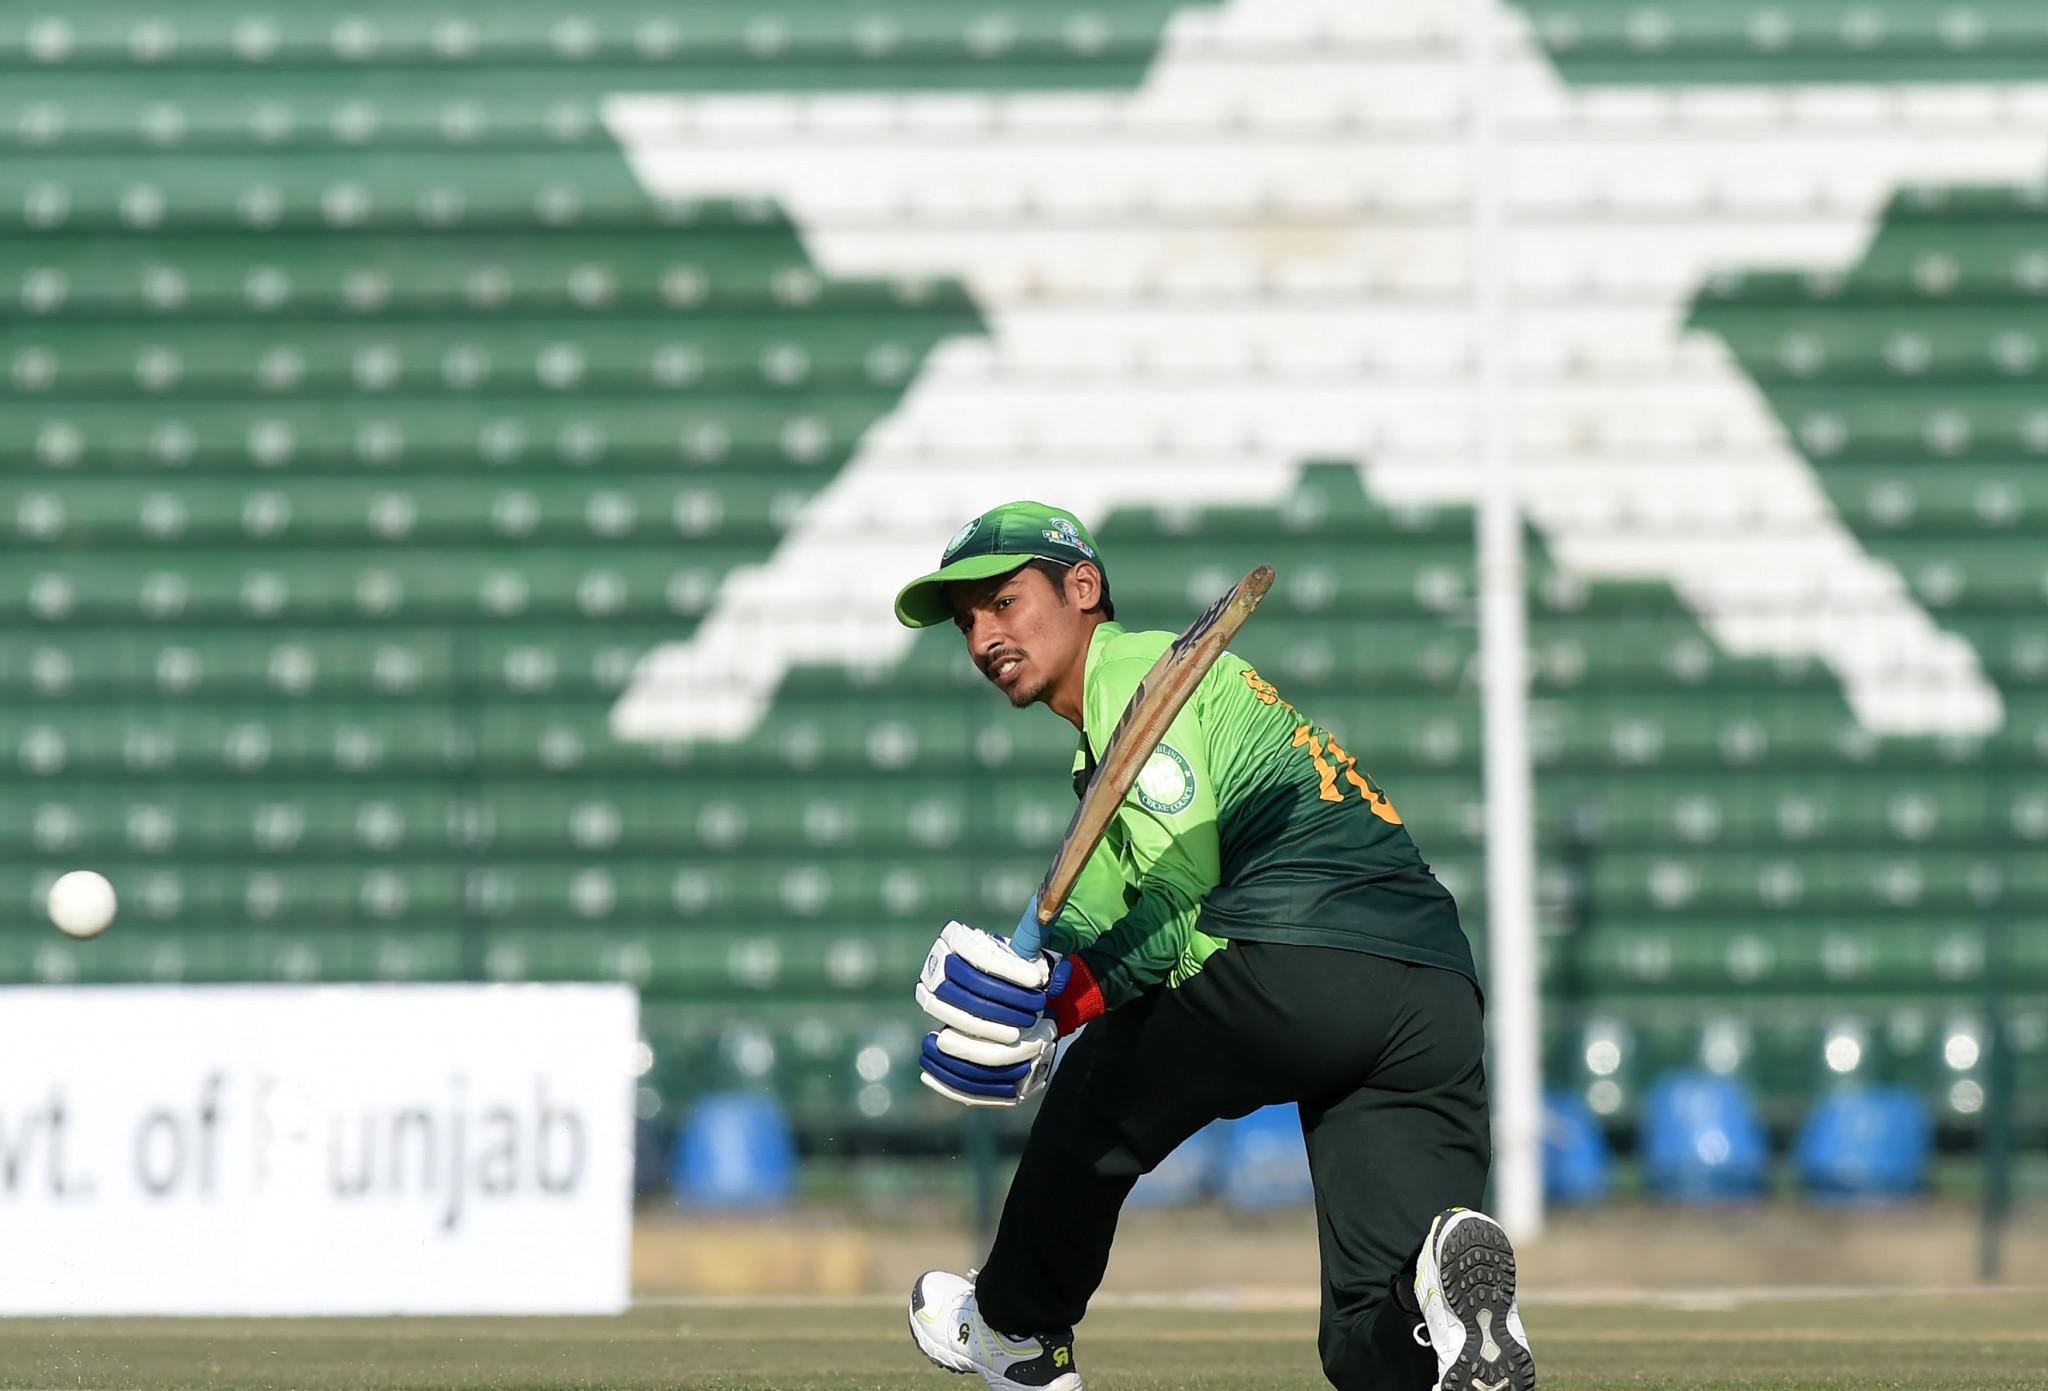 Pakistan down Sri Lanka at Blind Cricket World Cup